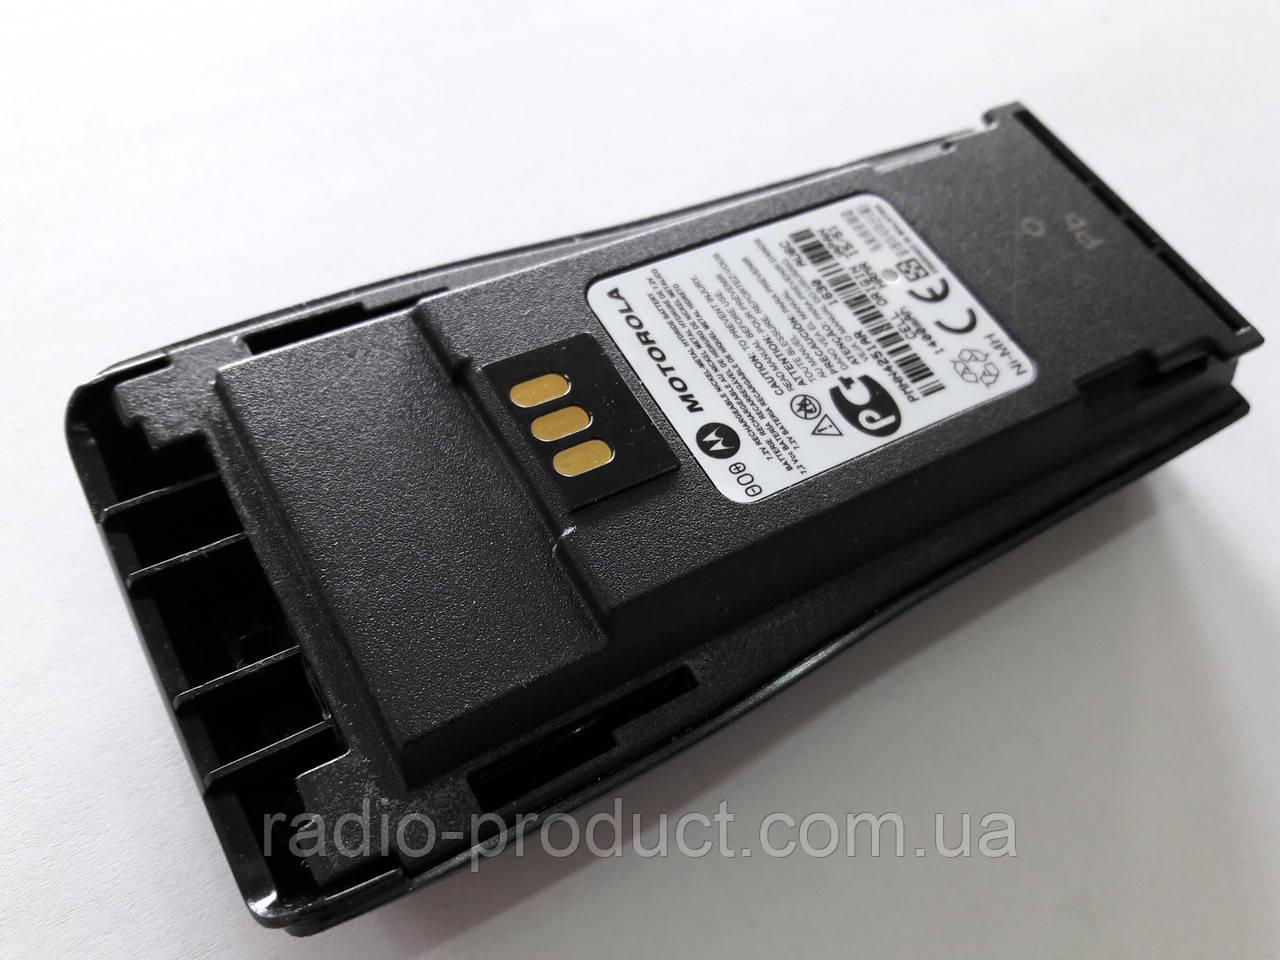 Аккумулятор Motorola PMNN4251 / PMNN4251AR, CP040, DP1400, CP140, etc